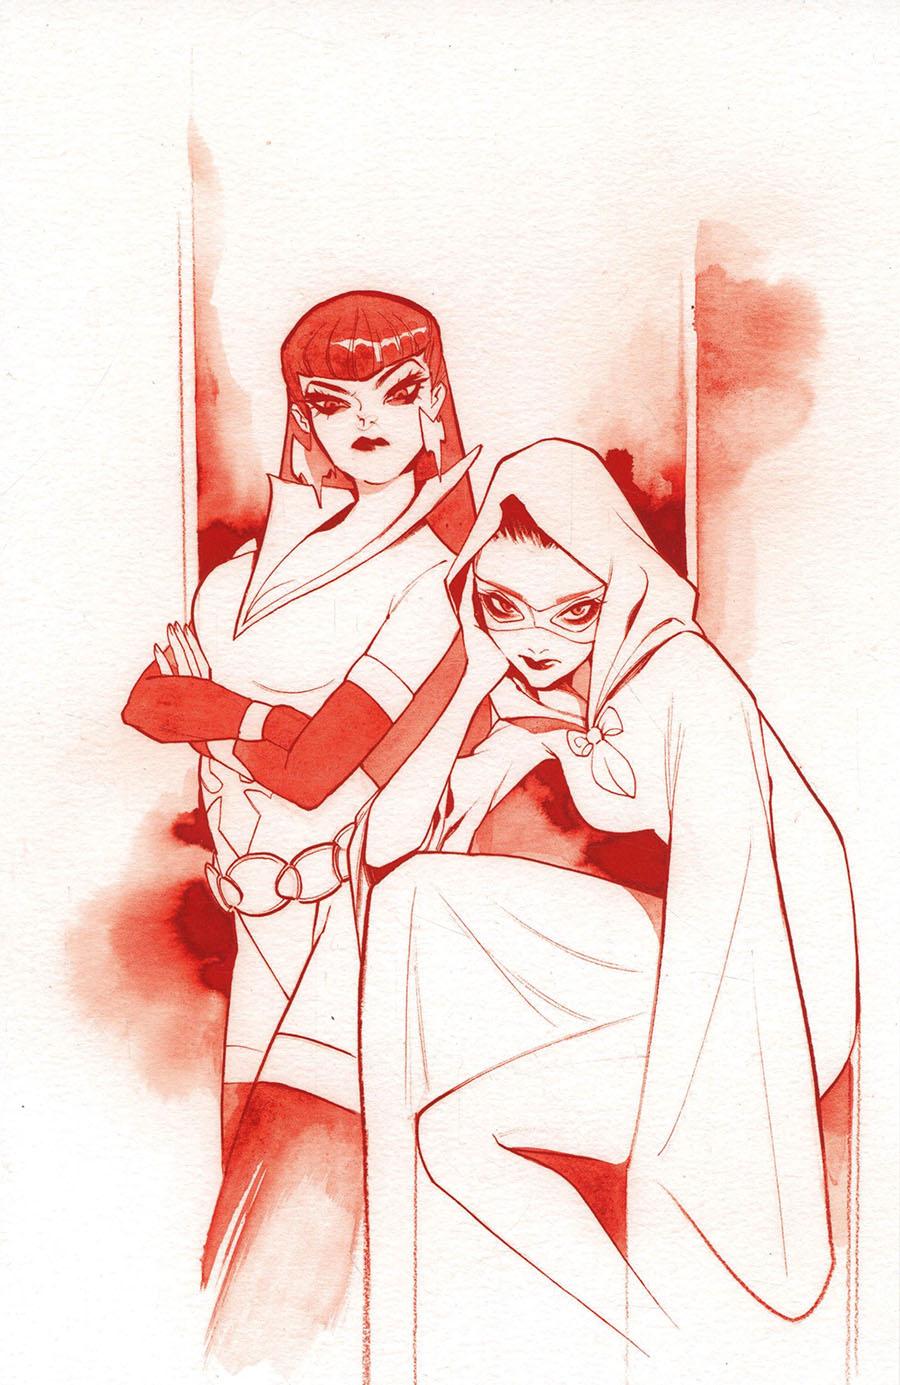 Vampirella The Dark Powers #1 Cover Z-G Ultra-Premium Limited Edition Peach Momoko Crimson Red Line Art Virgin Cover